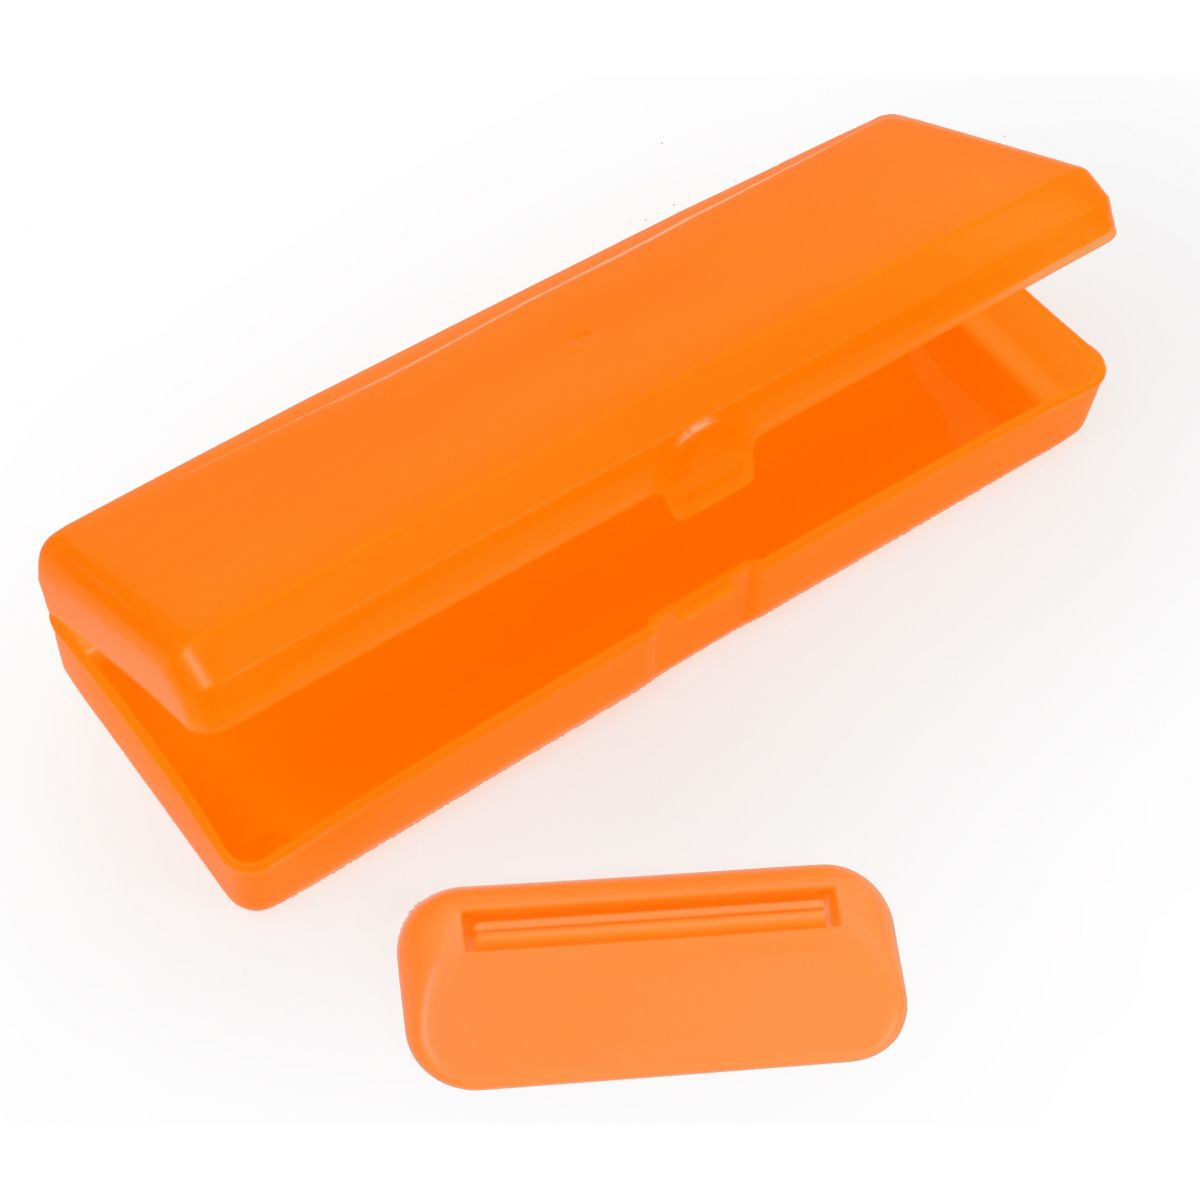 Estojo Dental Plástico Com Espremedor De Tubo - Santa Clara